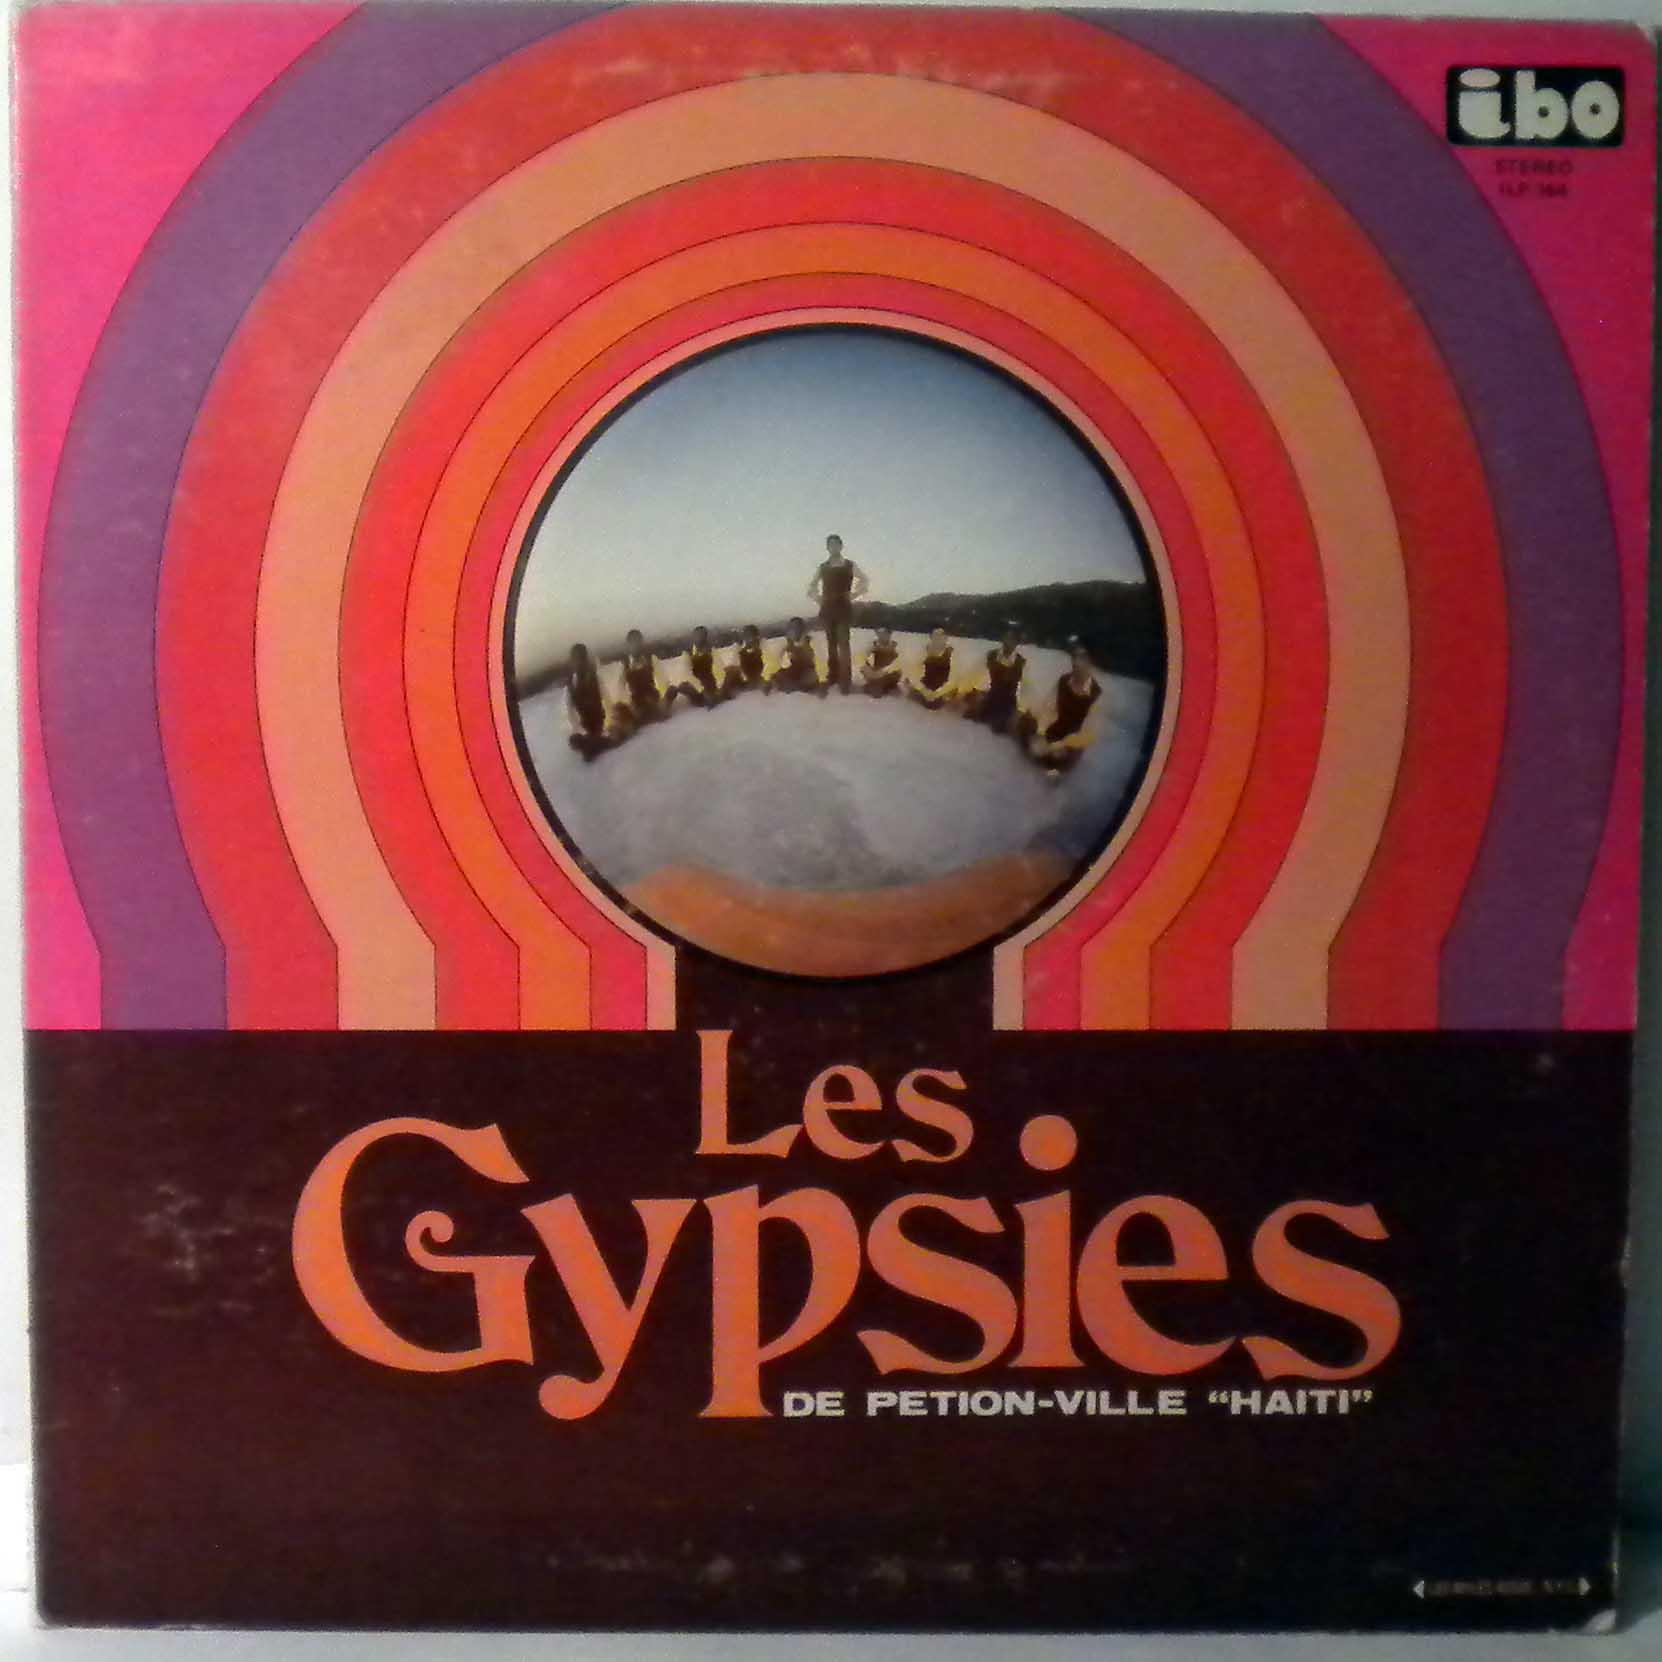 LES GYPSIES DE PIETON-VILLE HAITI - Same - LP